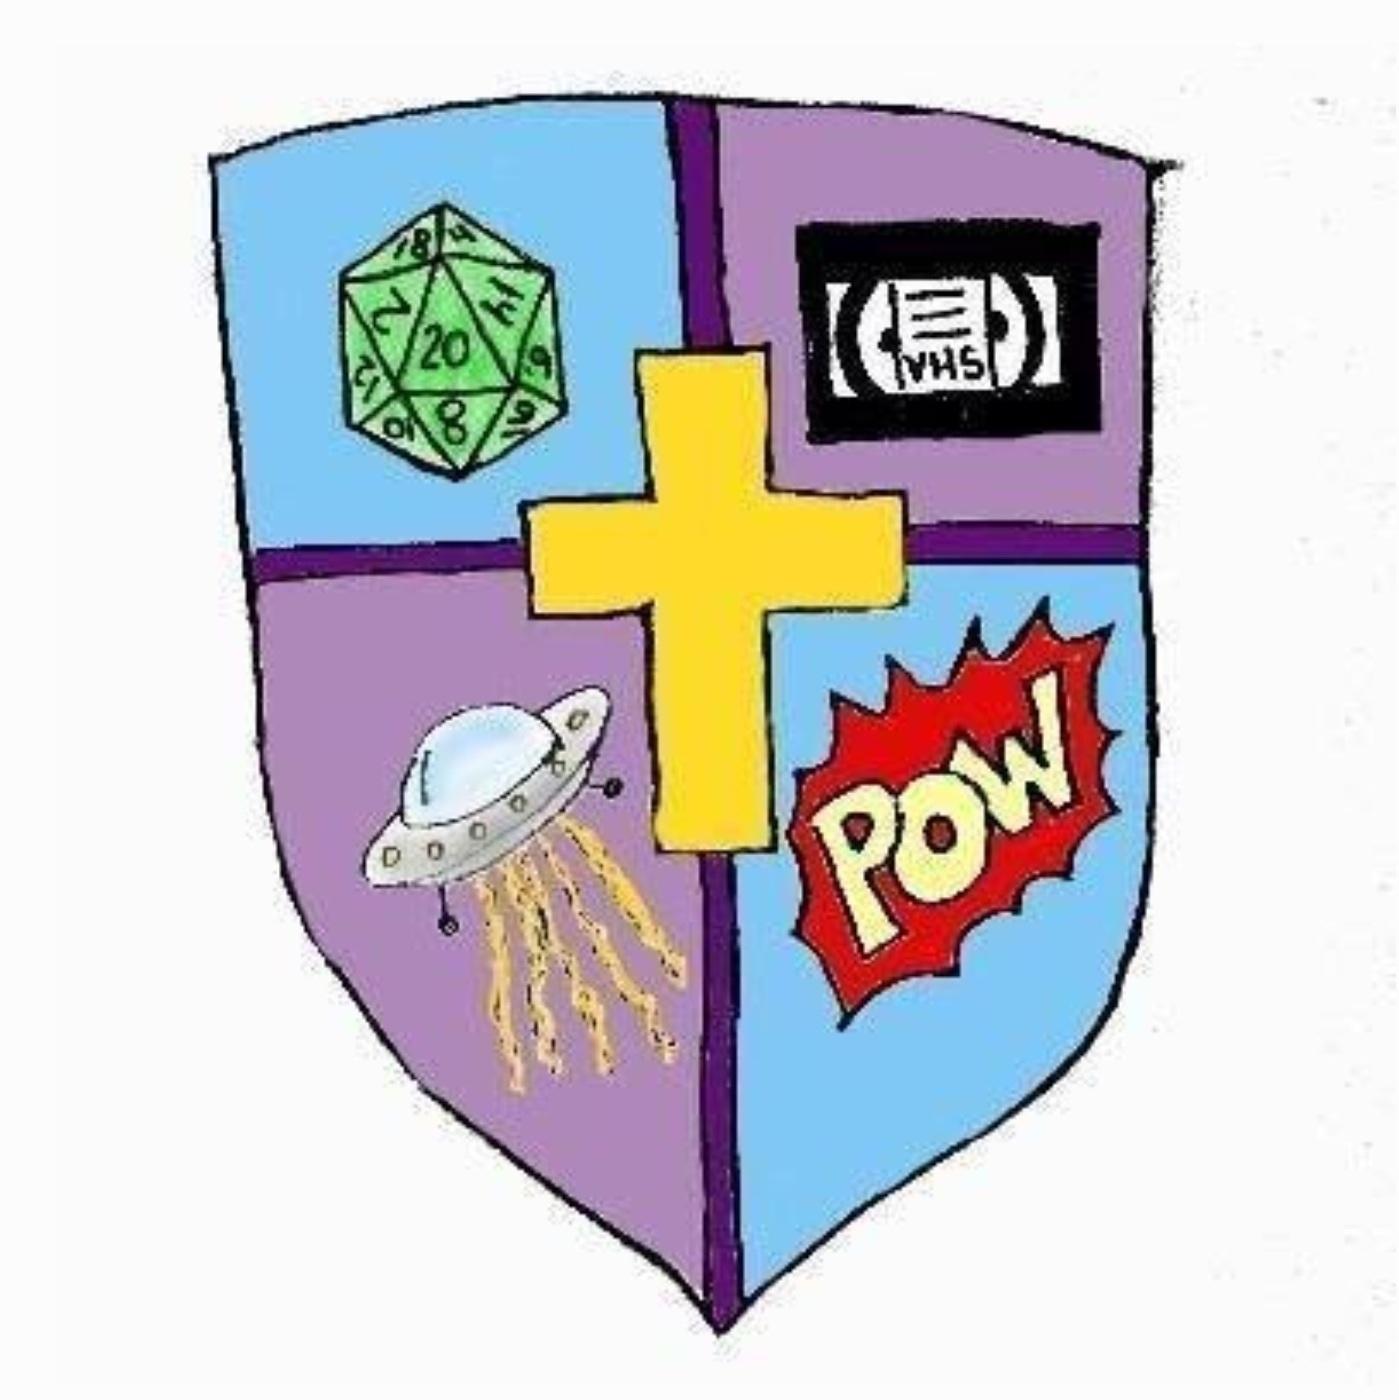 MOLDS episode 2 logo